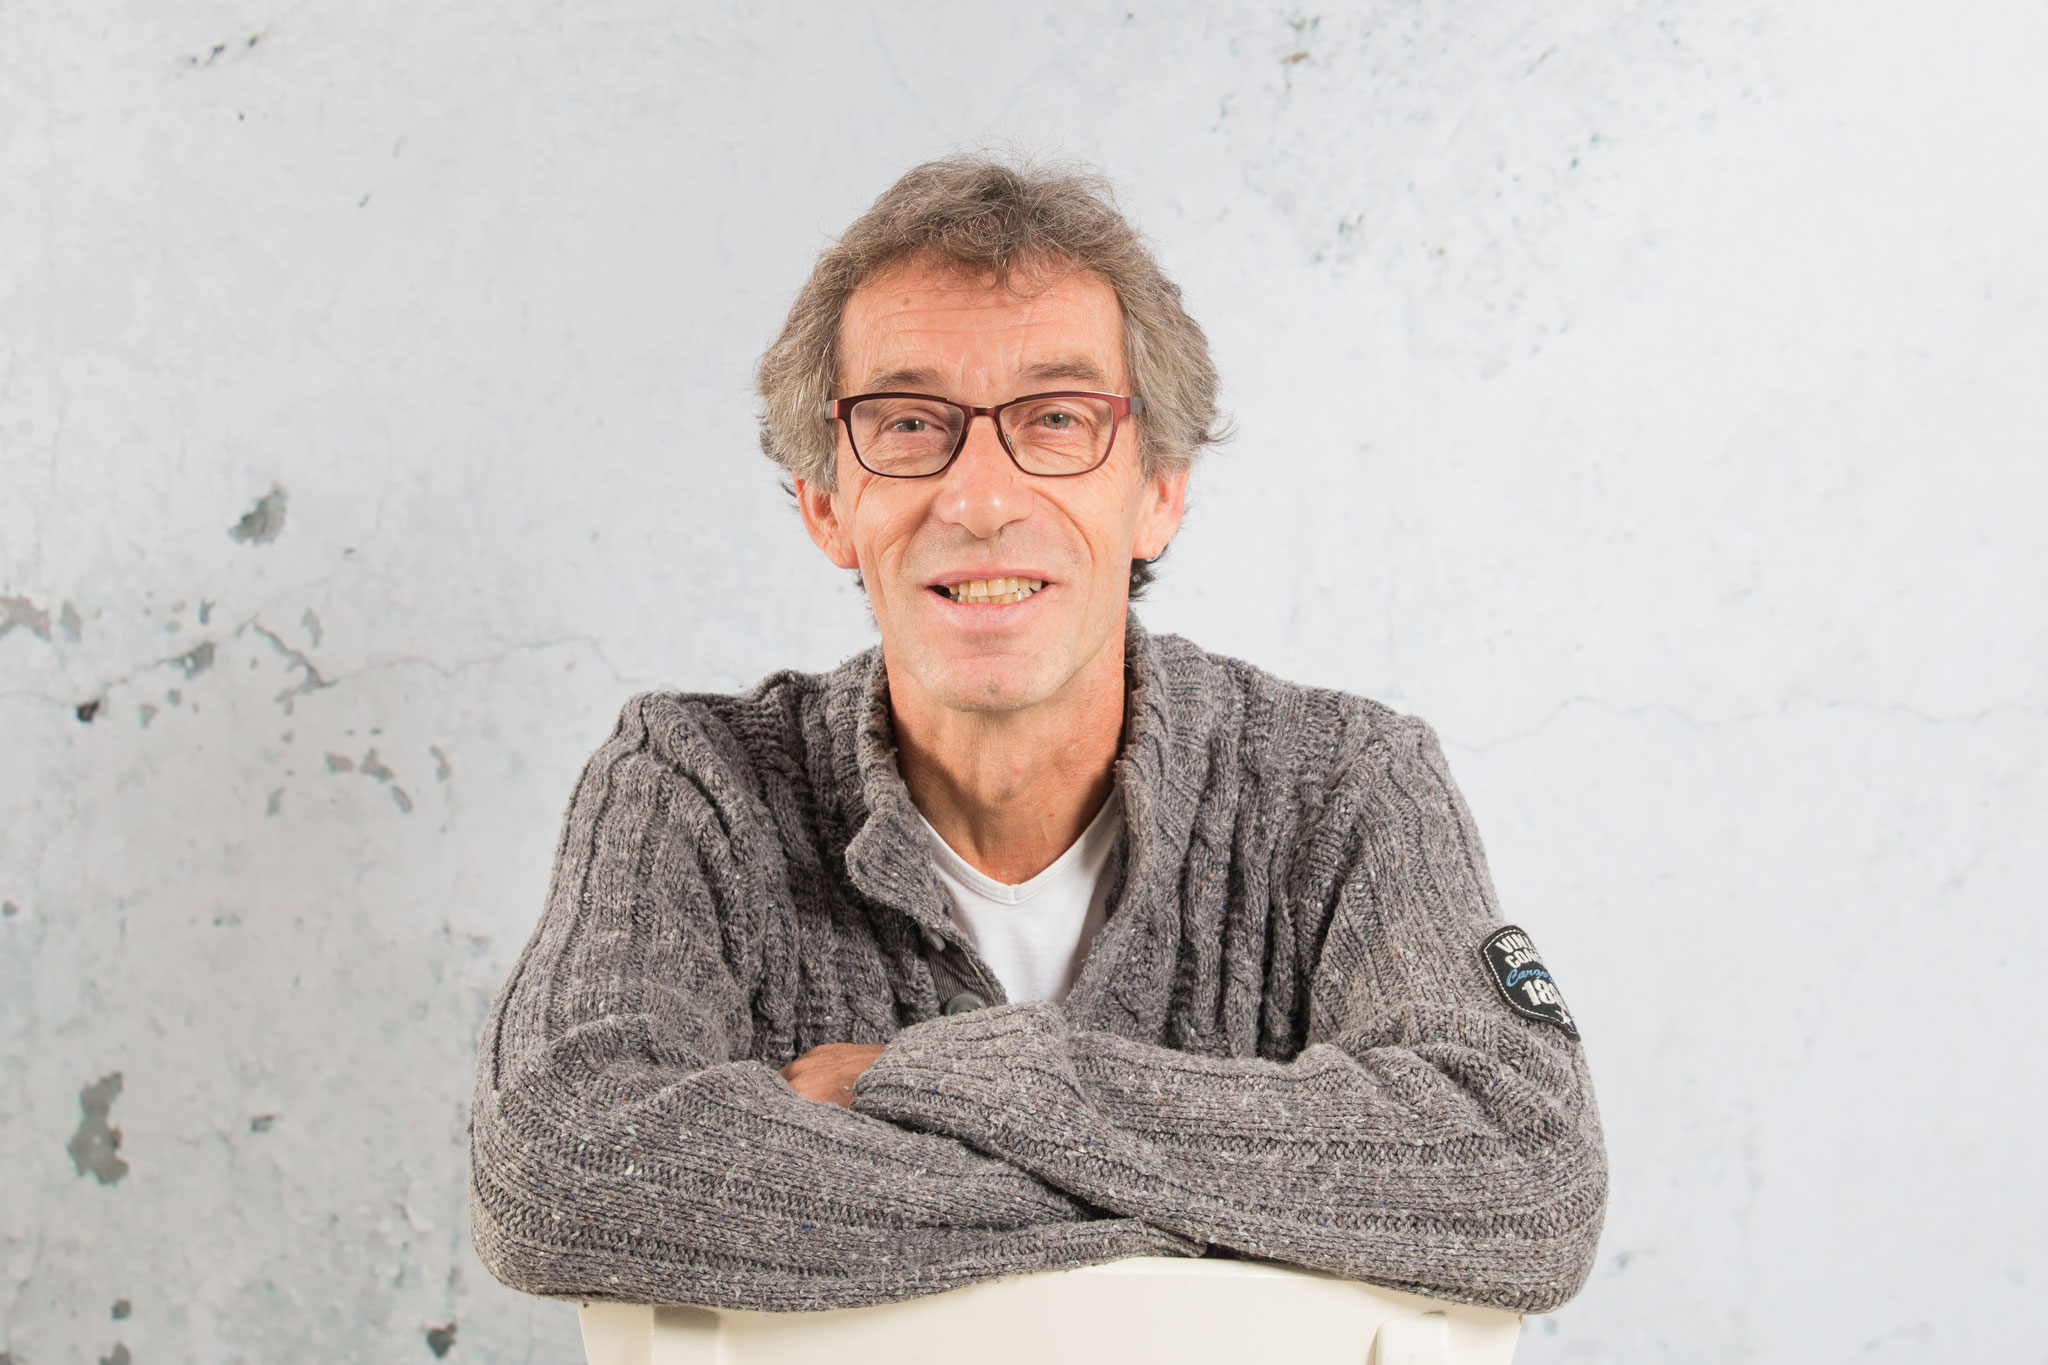 Henk Klompe